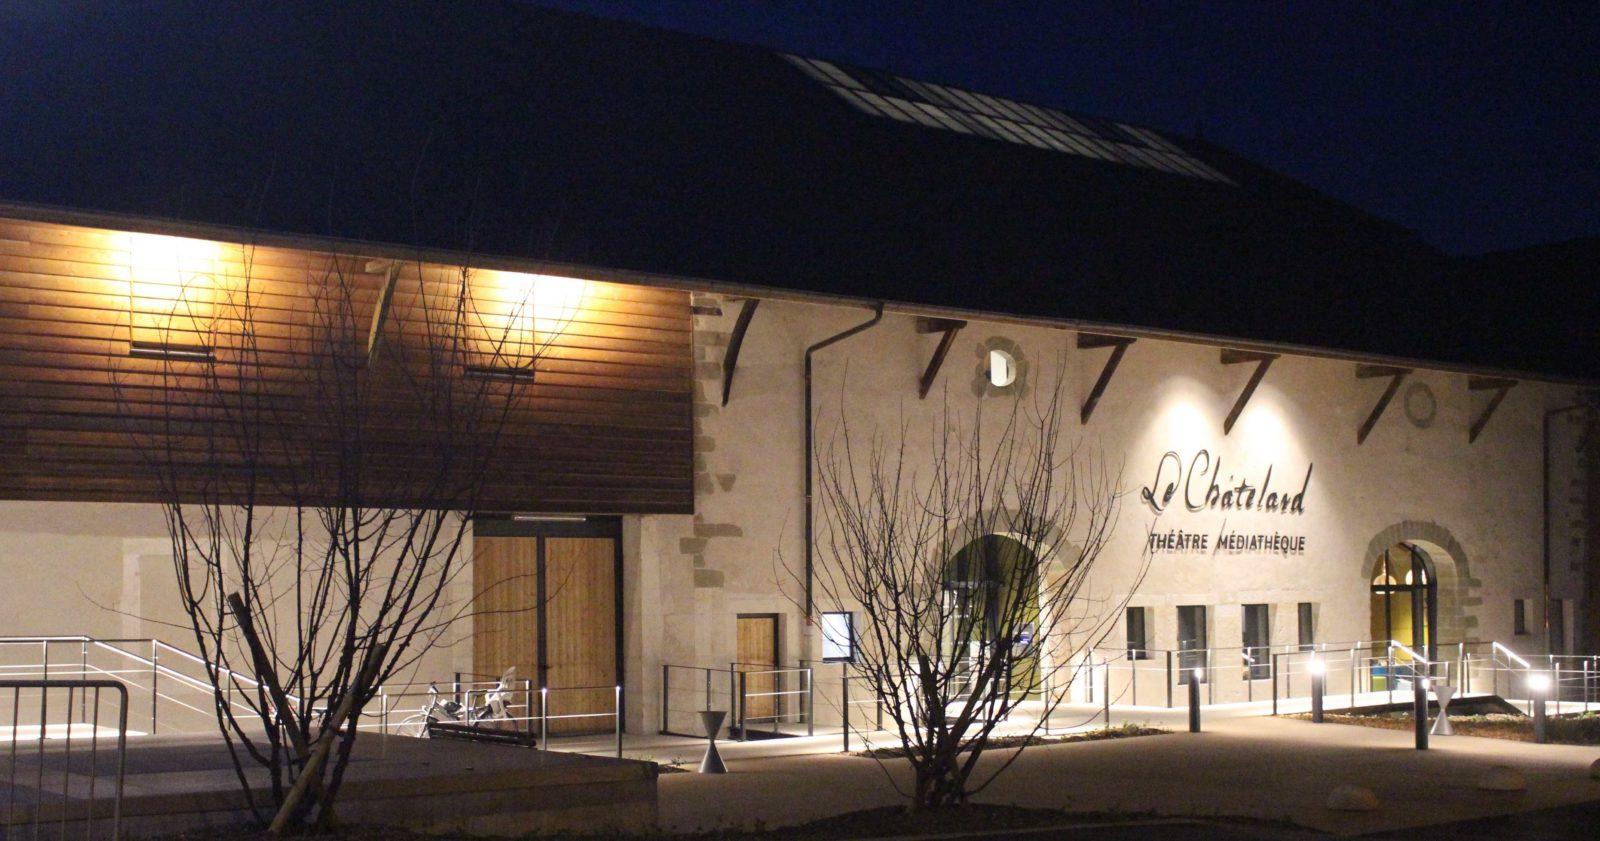 médiathèque de Ferney-Voltaire façade de nuit